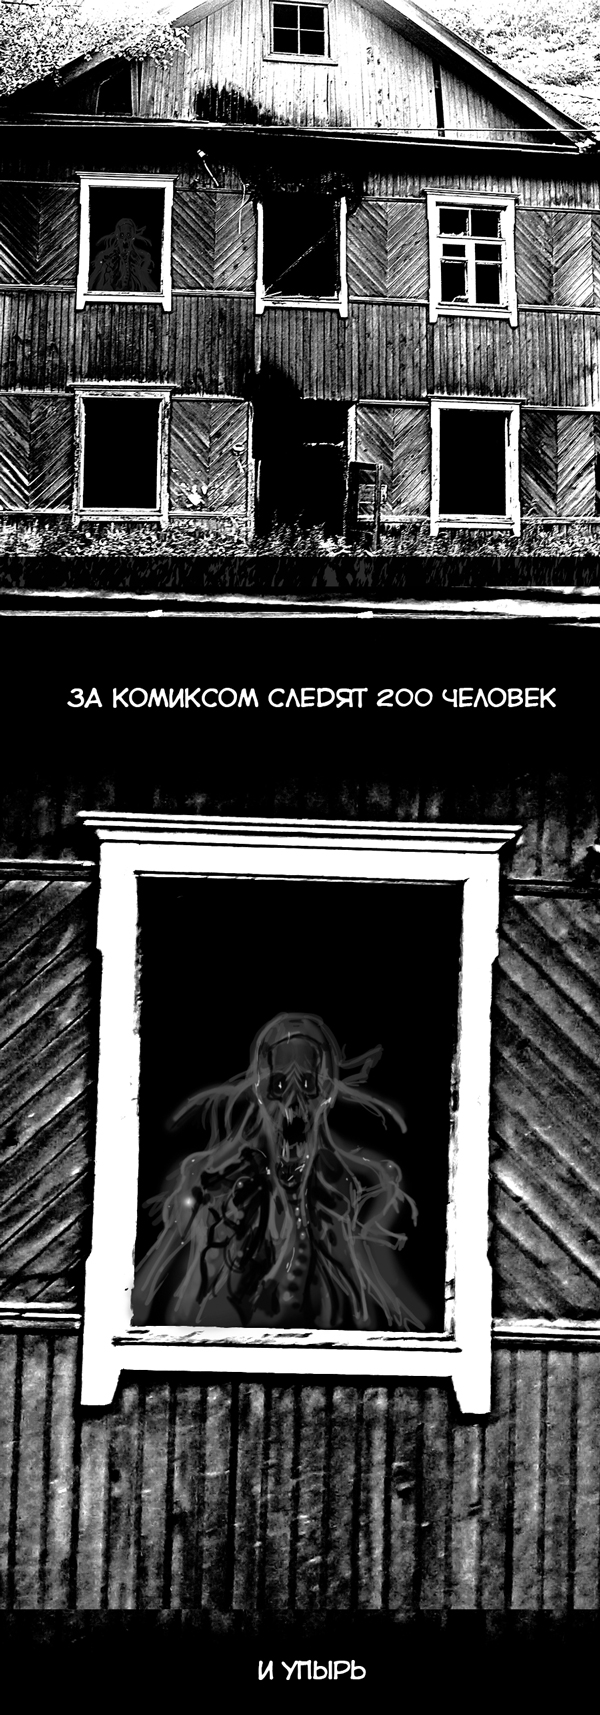 http://acomics.ru/upload/!c/hristenko/hvor/000055-u62jxgk4qs.jpg